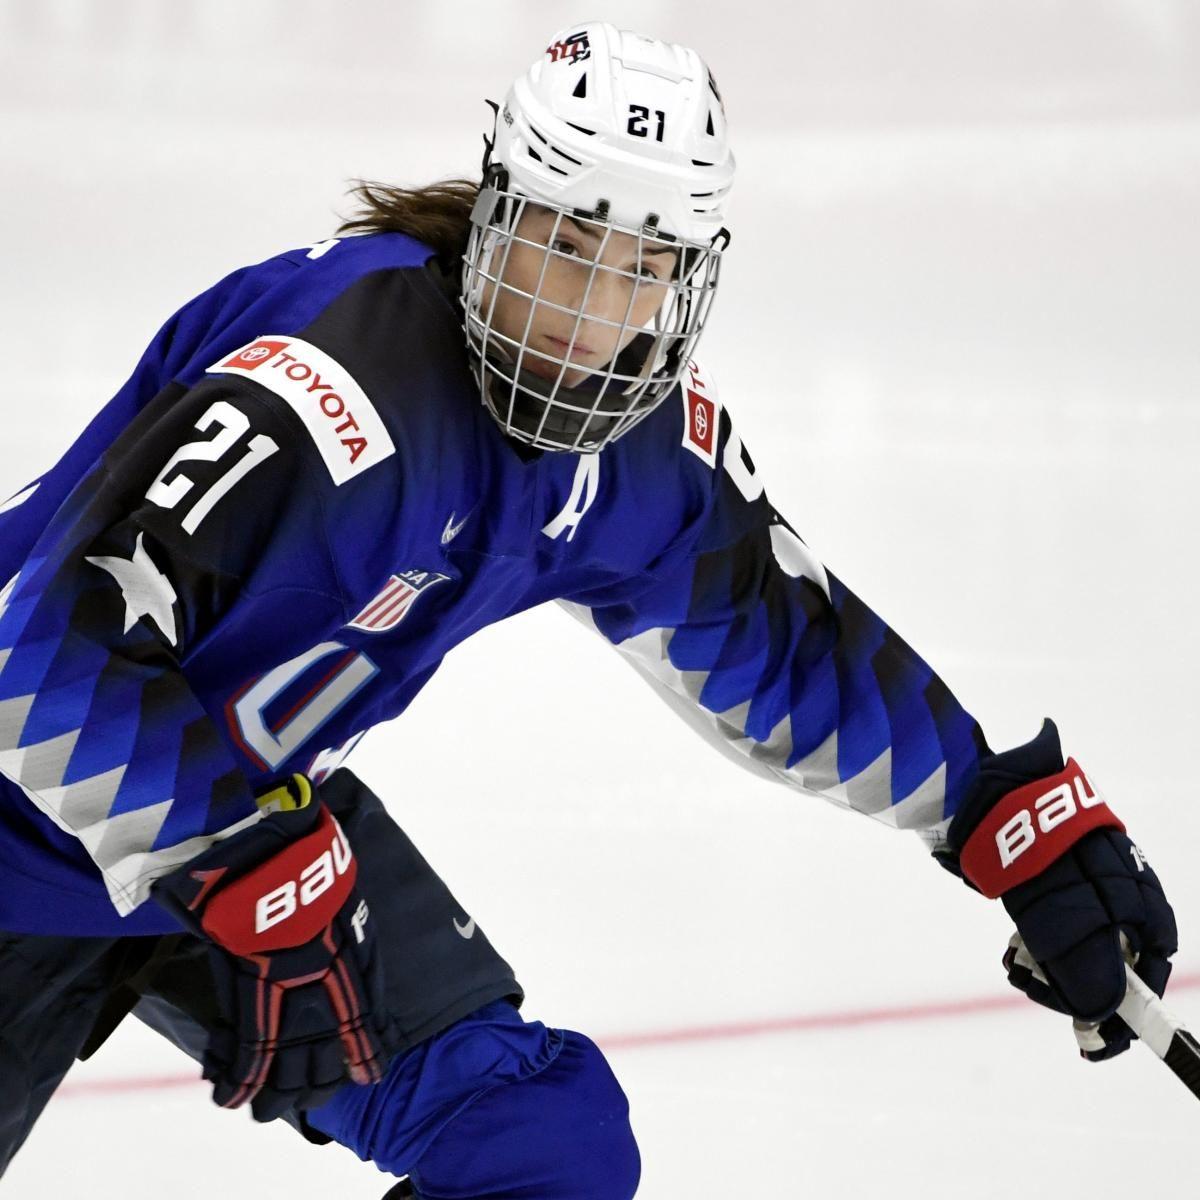 200 Plus Women S Hockey Players To Skip Next Nwhl Season Over State Of Sport In 2020 Women S Hockey Hockey Players Hockey